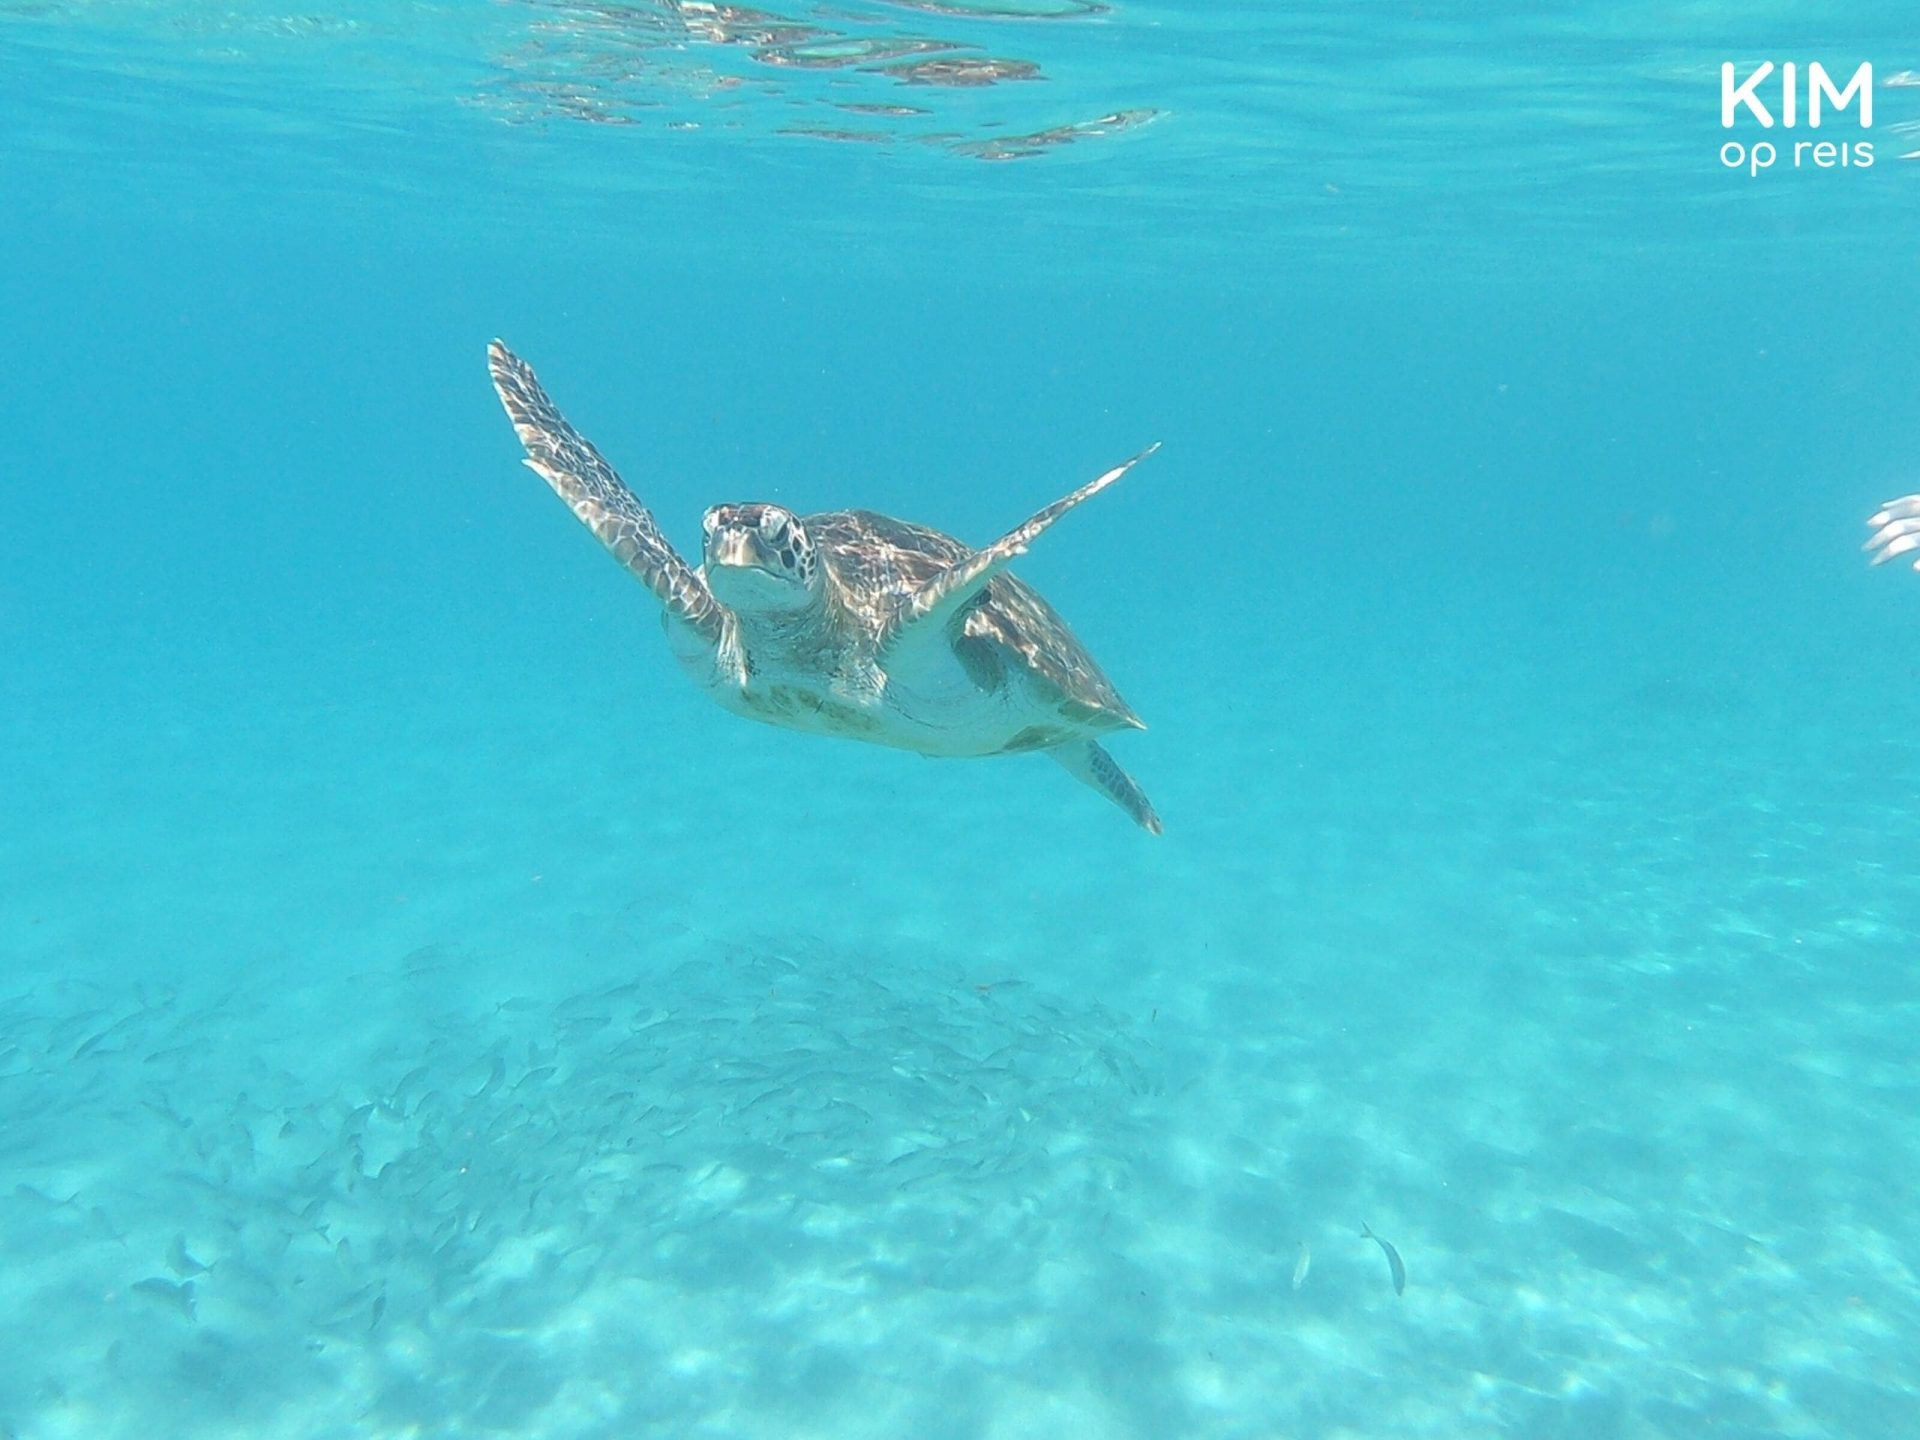 zwemmen schildpadden Curaçao: schildpad zwemt over een school vissen